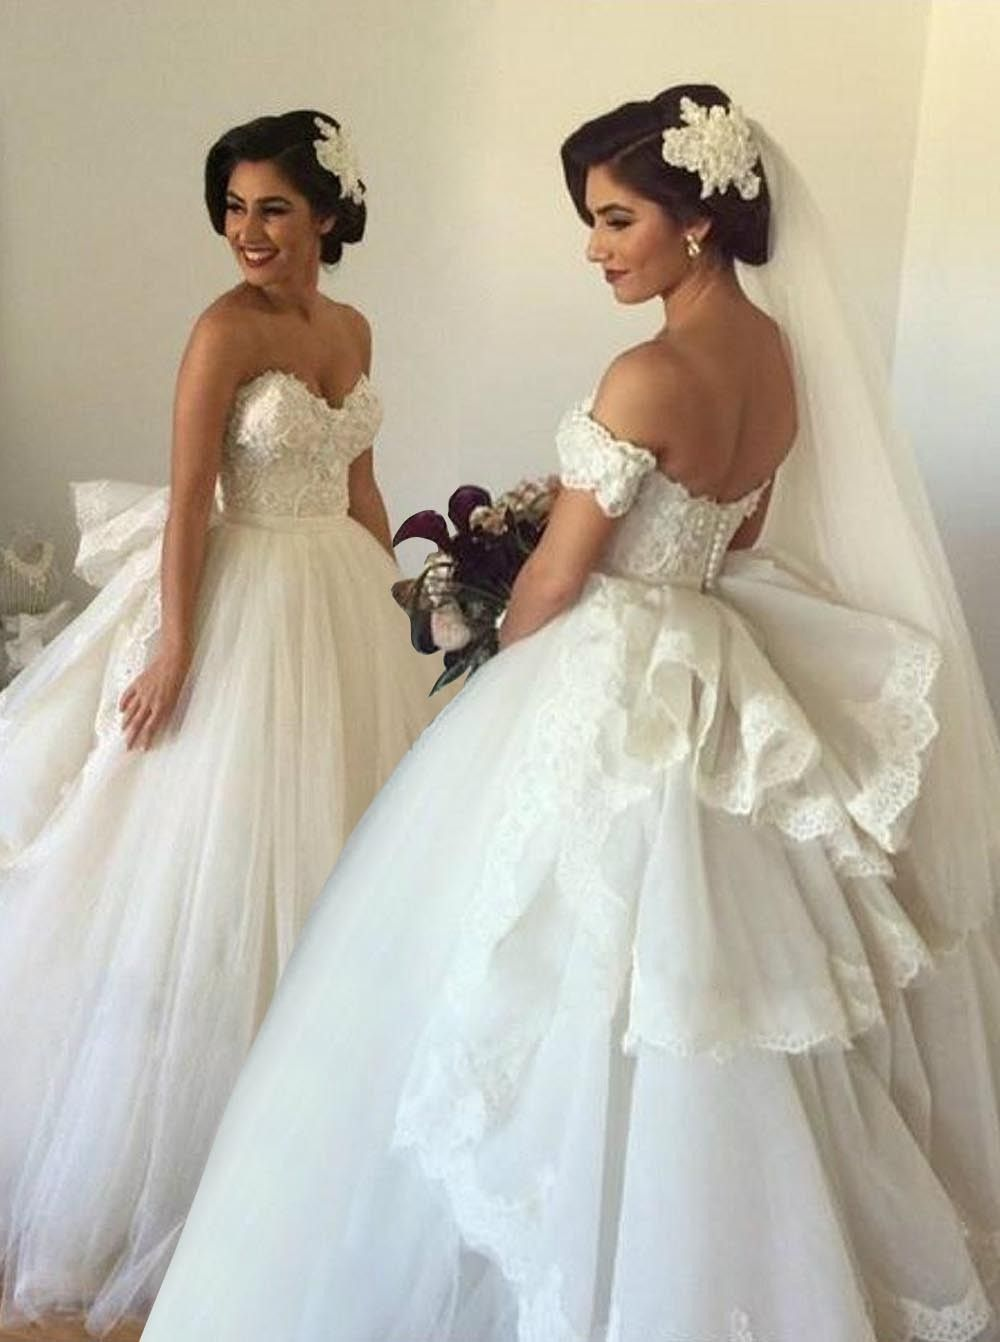 Gorgeous wedding dress ball gown sweetheart wedding dress for Off the shoulder wedding dress topper